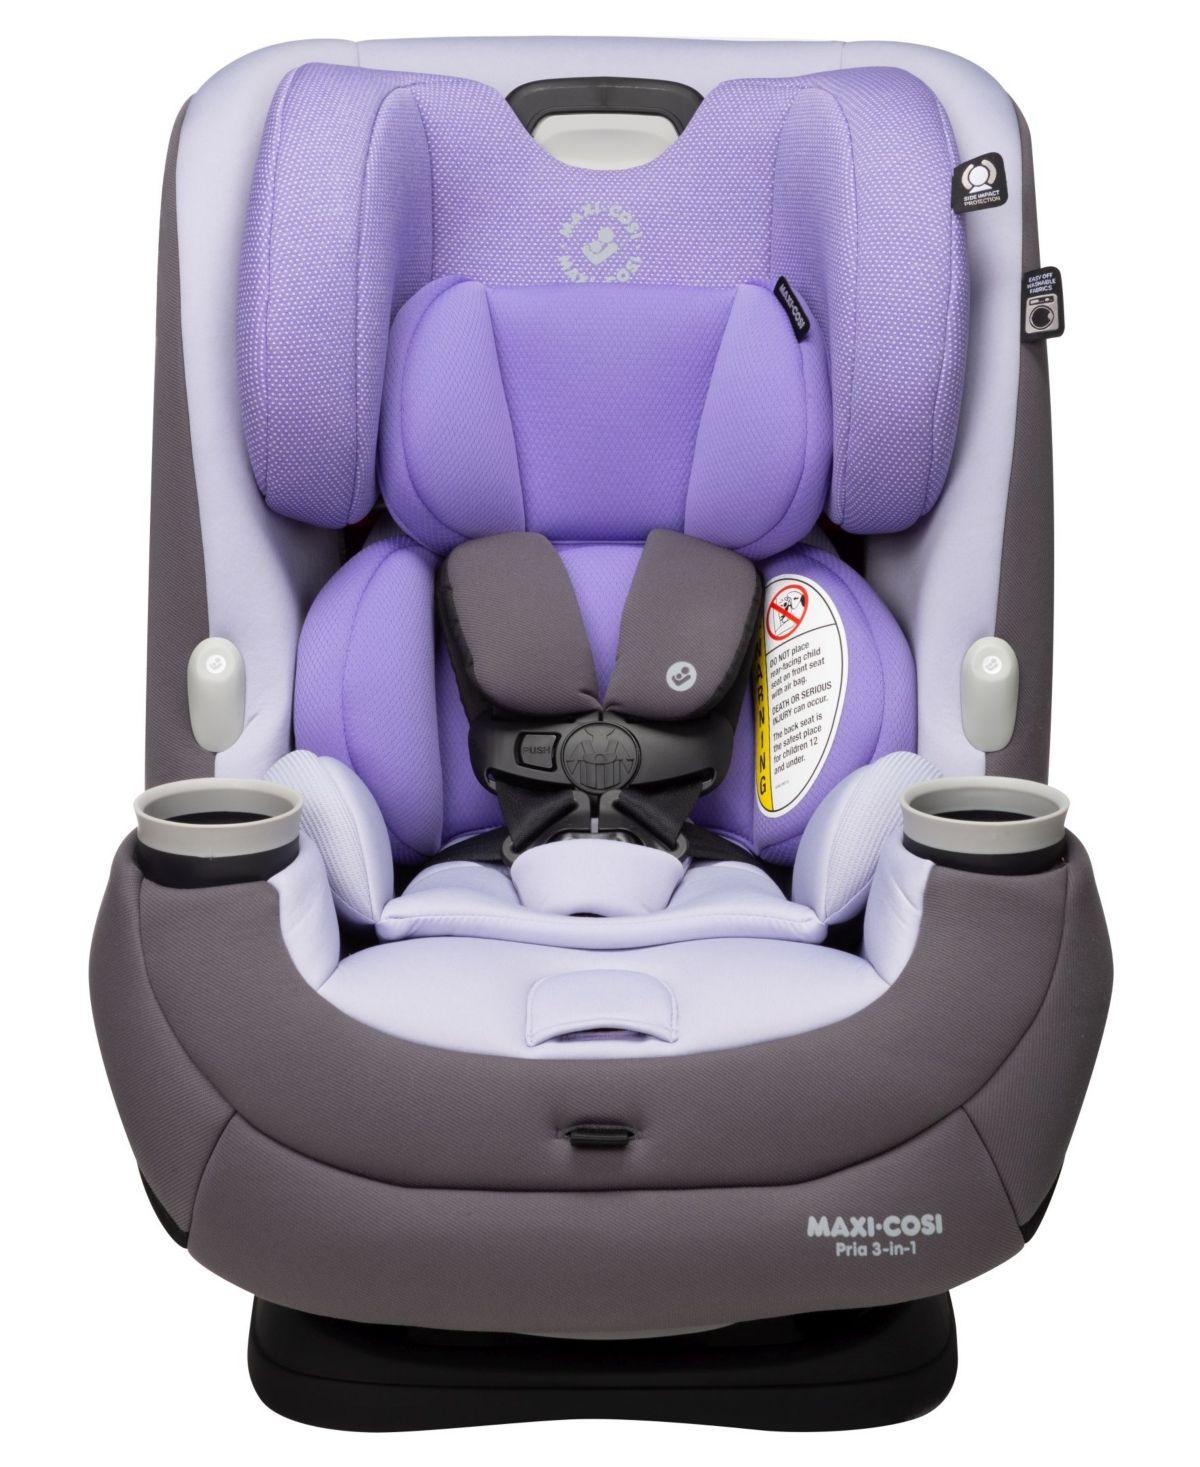 Maxi Cosi Maxi-Cosi® Pria 3-in-1 Car Seat & Reviews - All Baby Gear & Essentials - Kids - Macy's